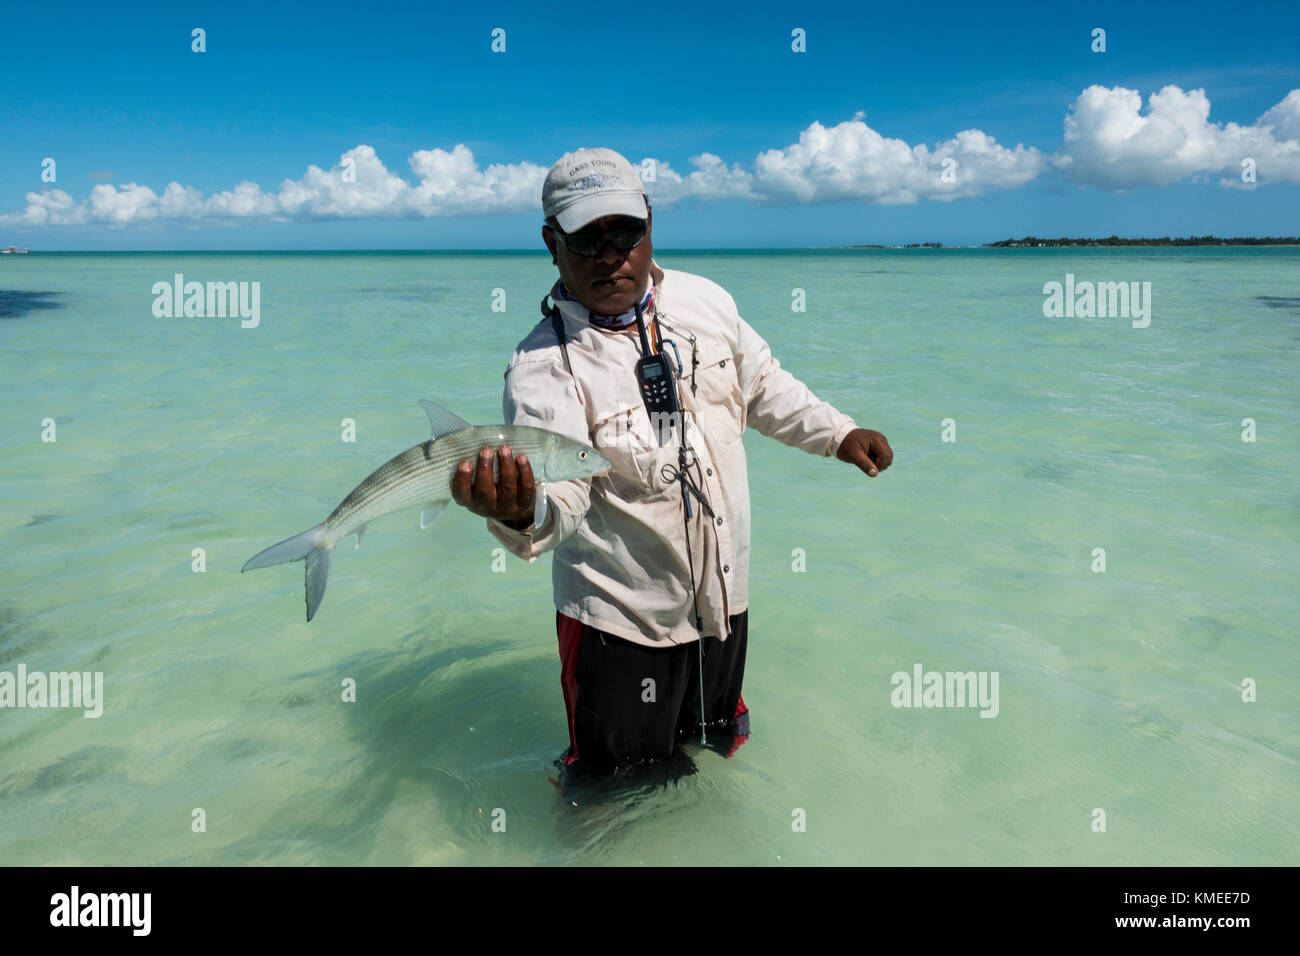 Bonefish caught at Christmas Island (Kiribati) - Stock Image